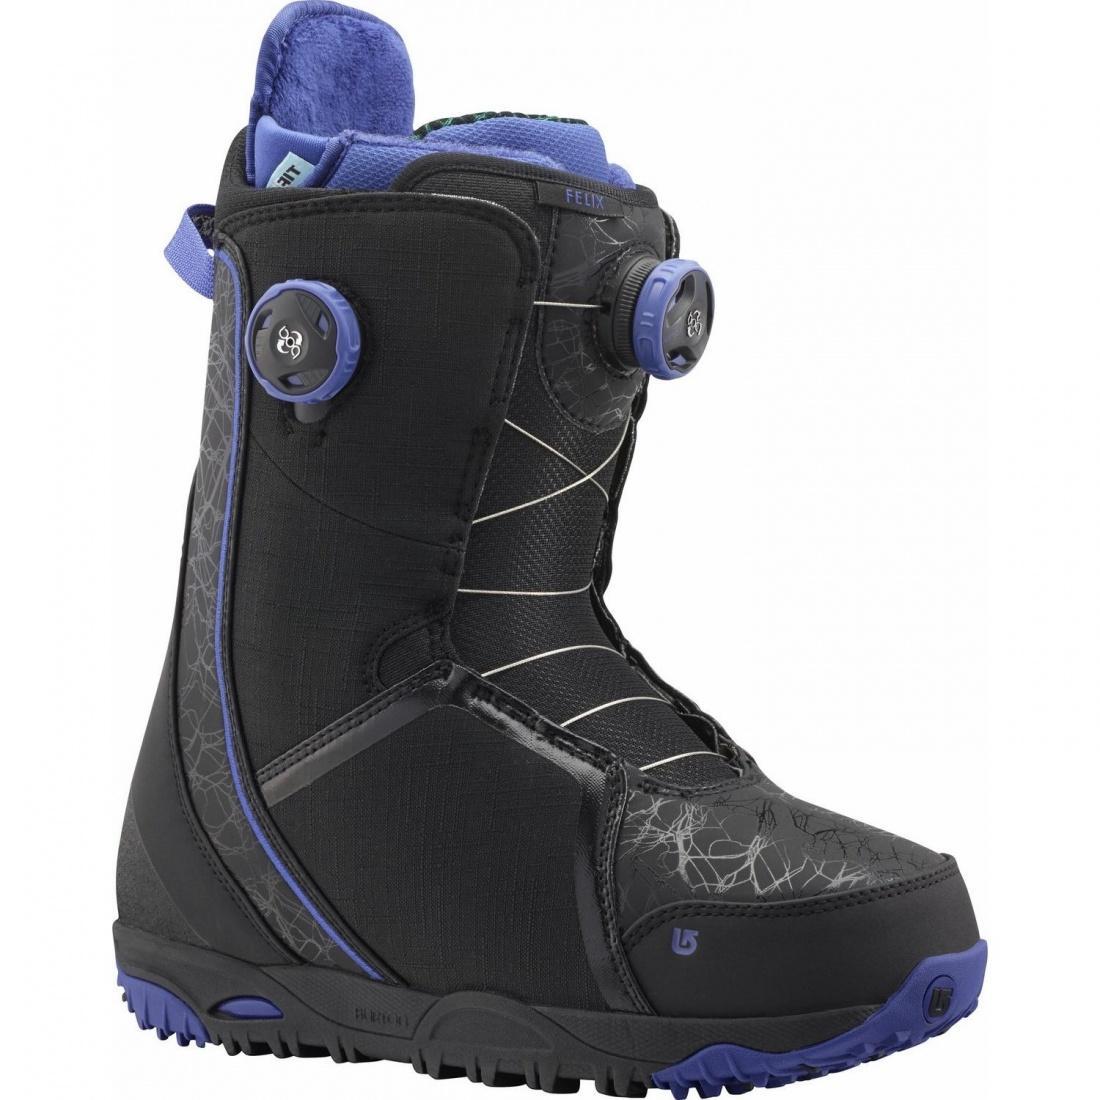 Ботинки для сноуборда Burton Felix BOA Black/Purple 7